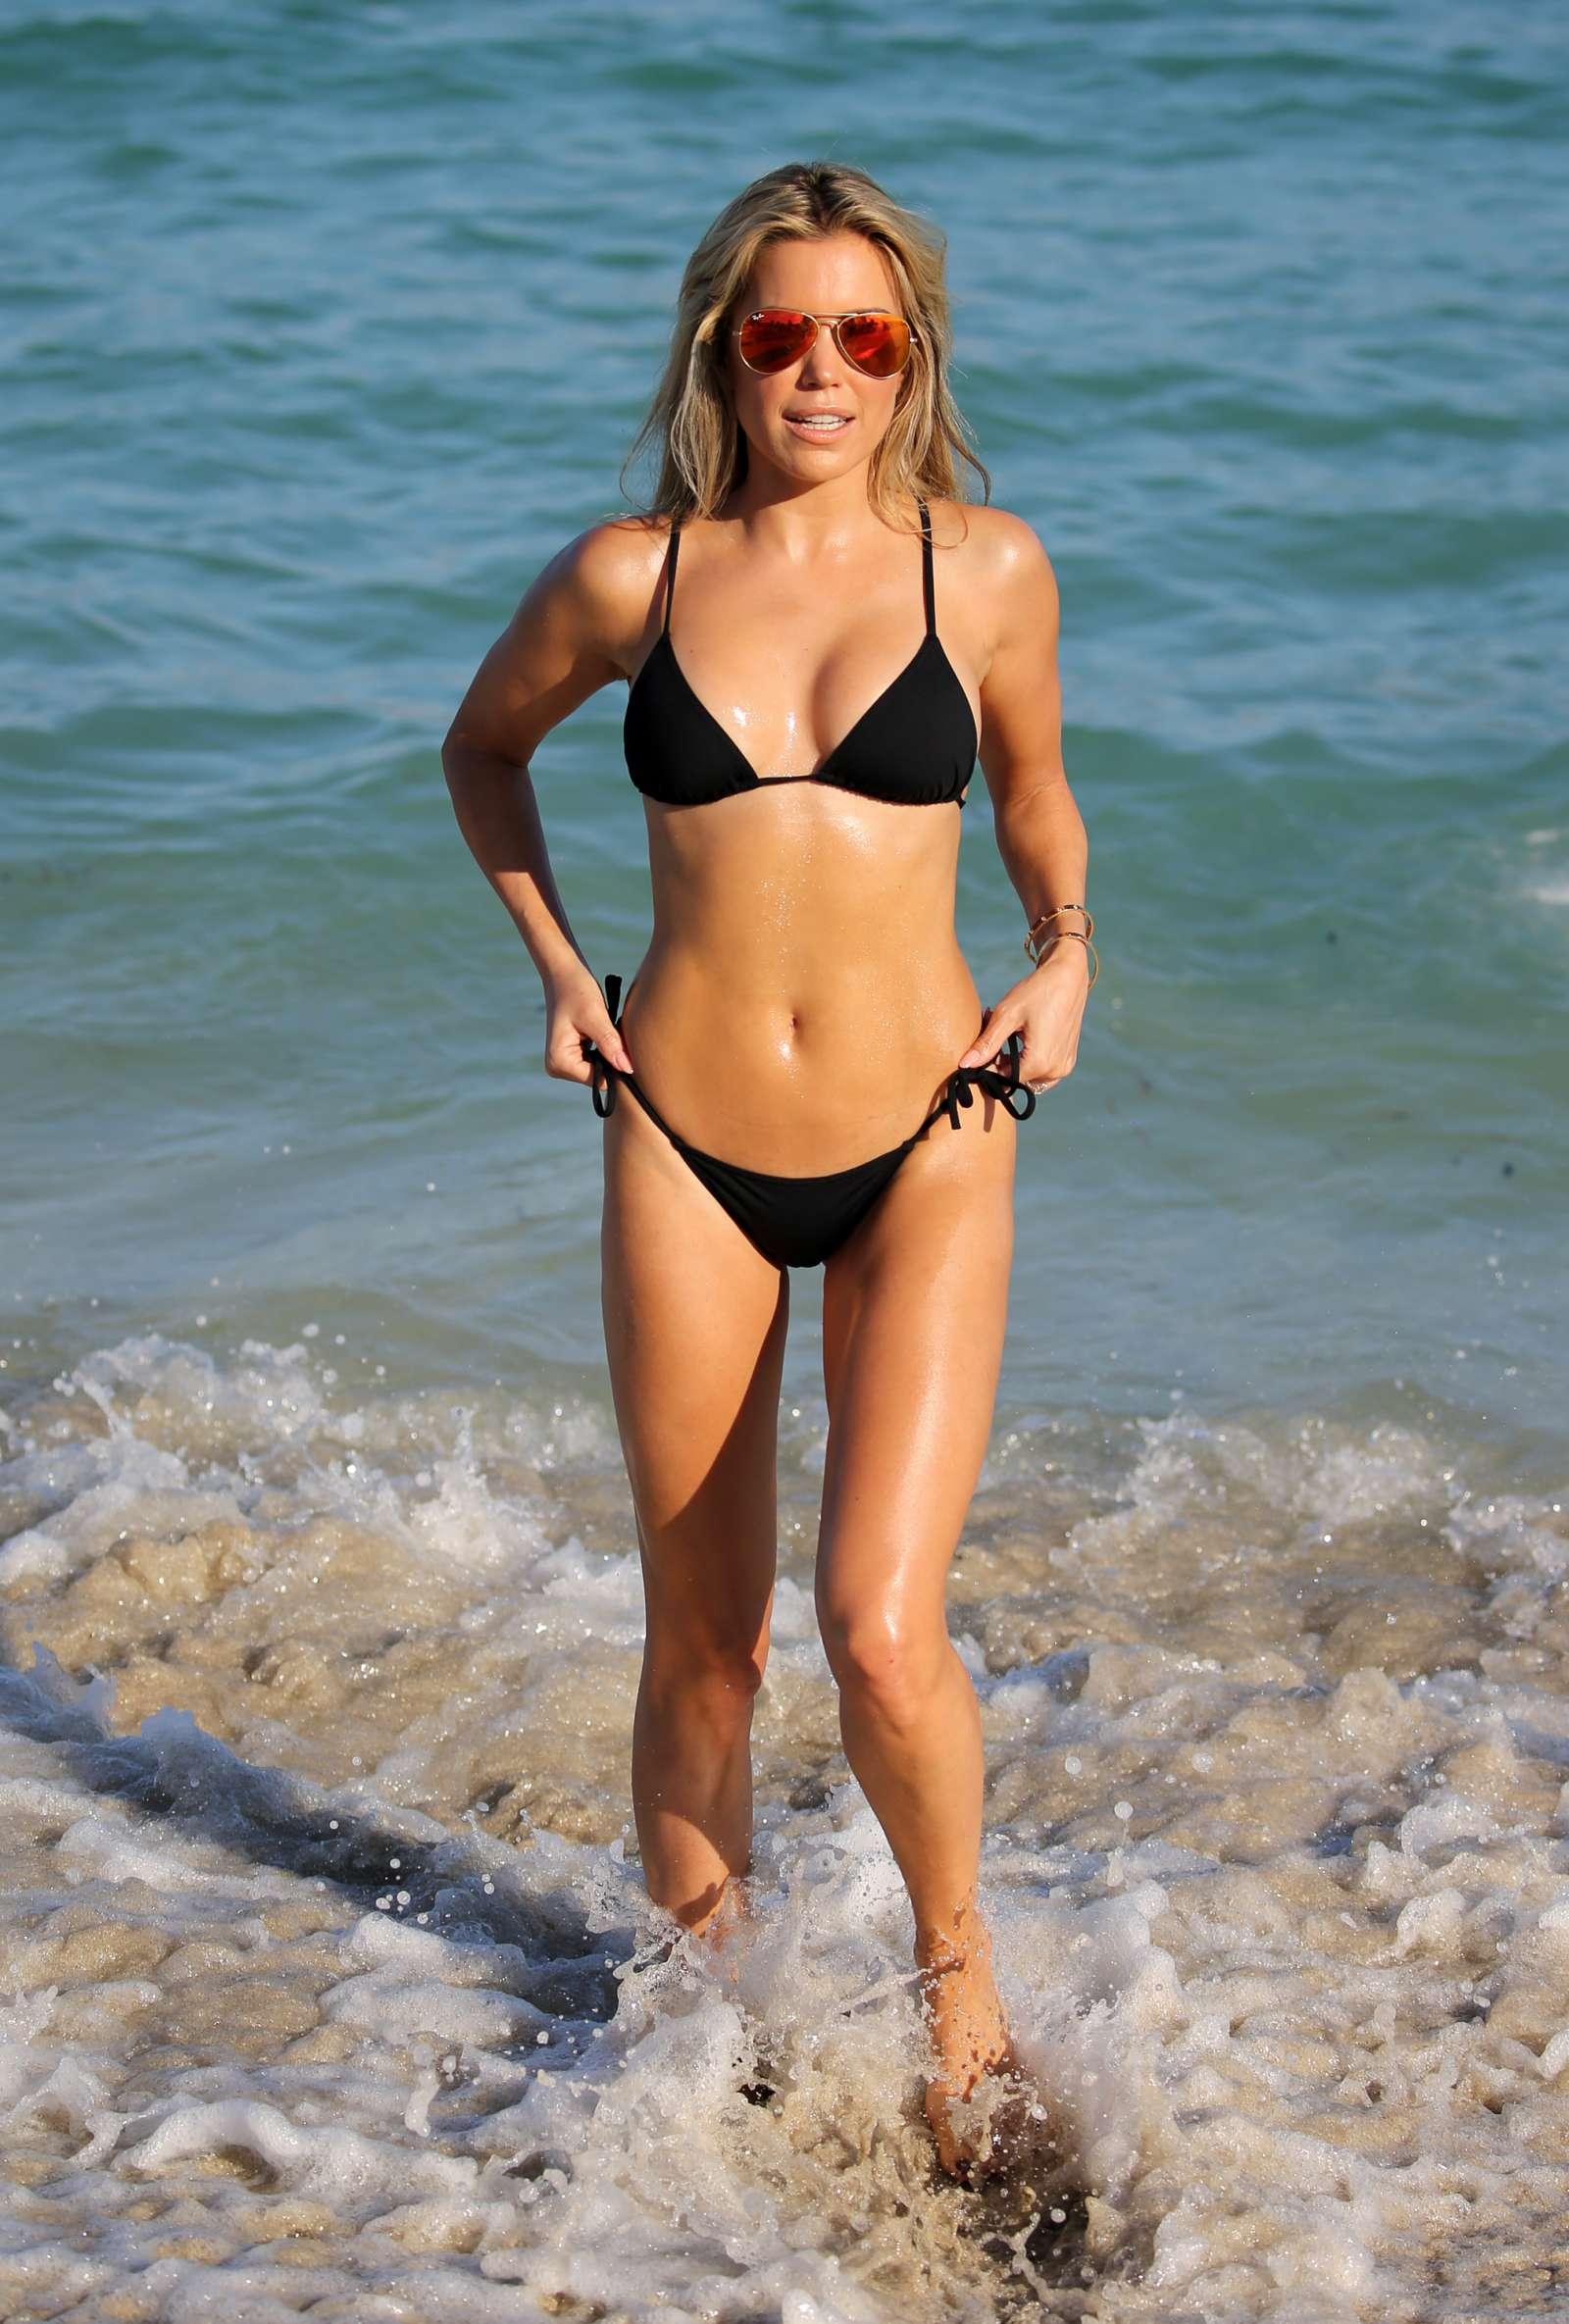 Sylvie Meis 2017 : Sylvie Meis in Black Bikini 2017 -29